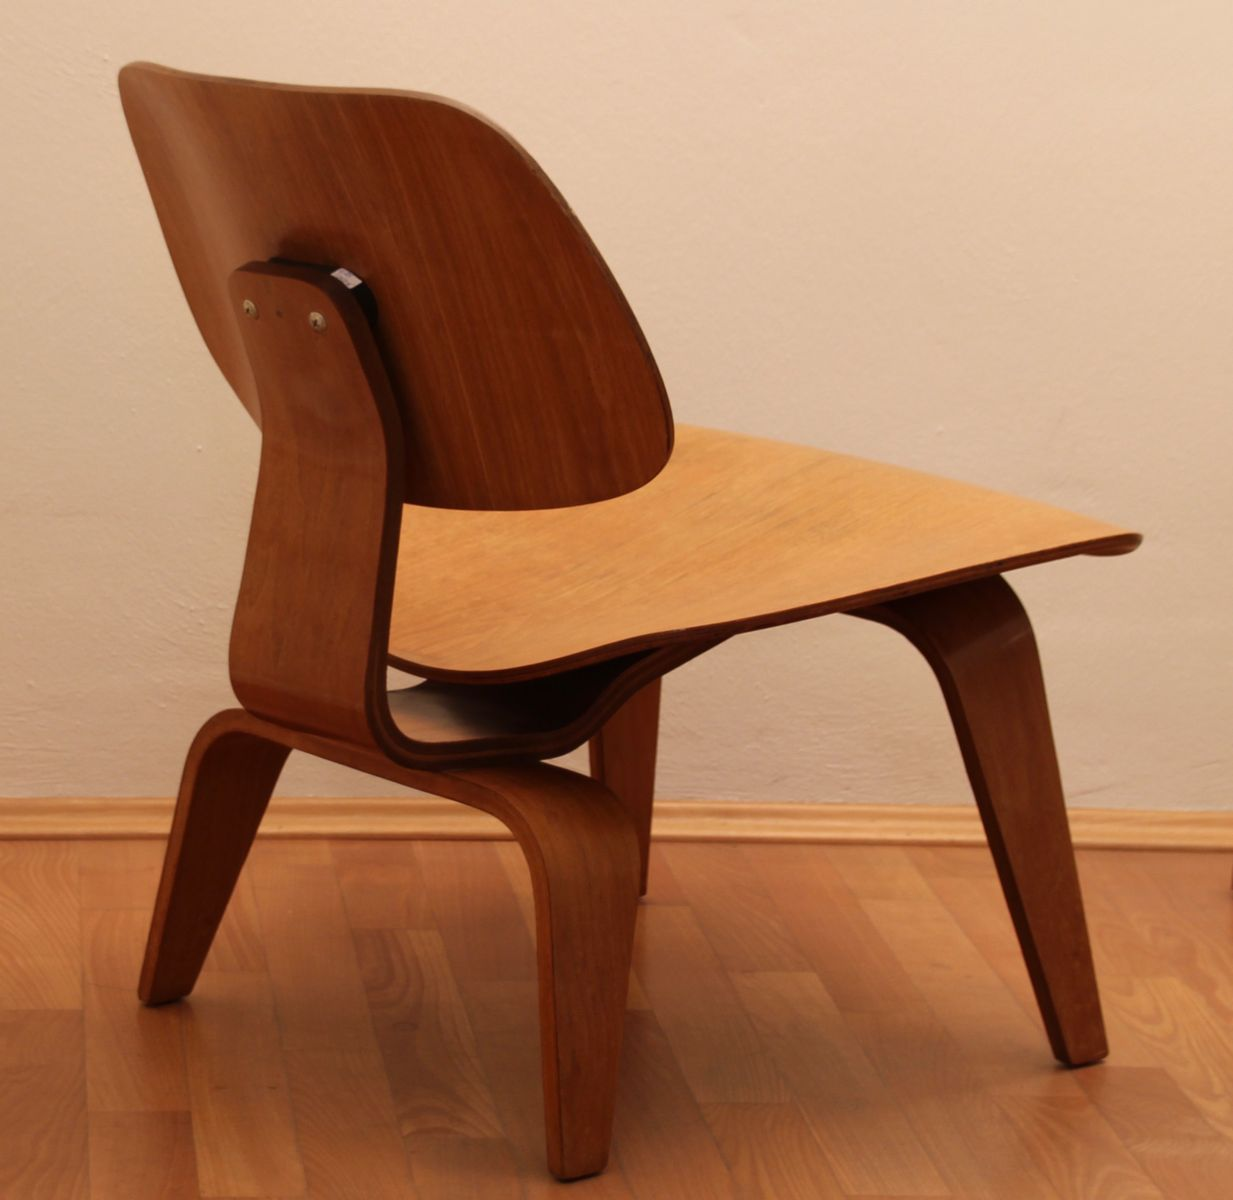 lcw stuhl von charles ray eames f r herman miller 1949. Black Bedroom Furniture Sets. Home Design Ideas